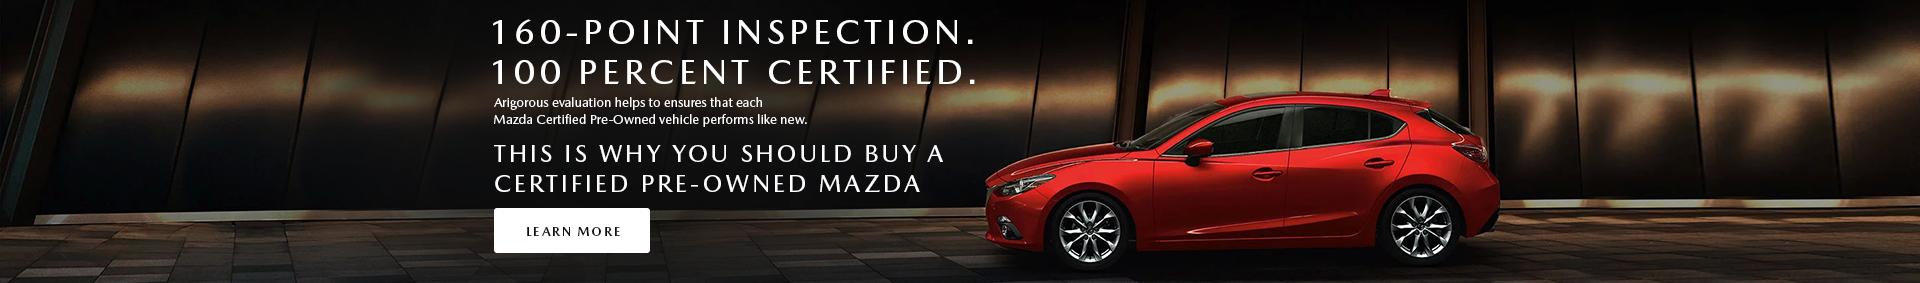 Destination Mazda Vancouver Certified Pre-Owned Mazda